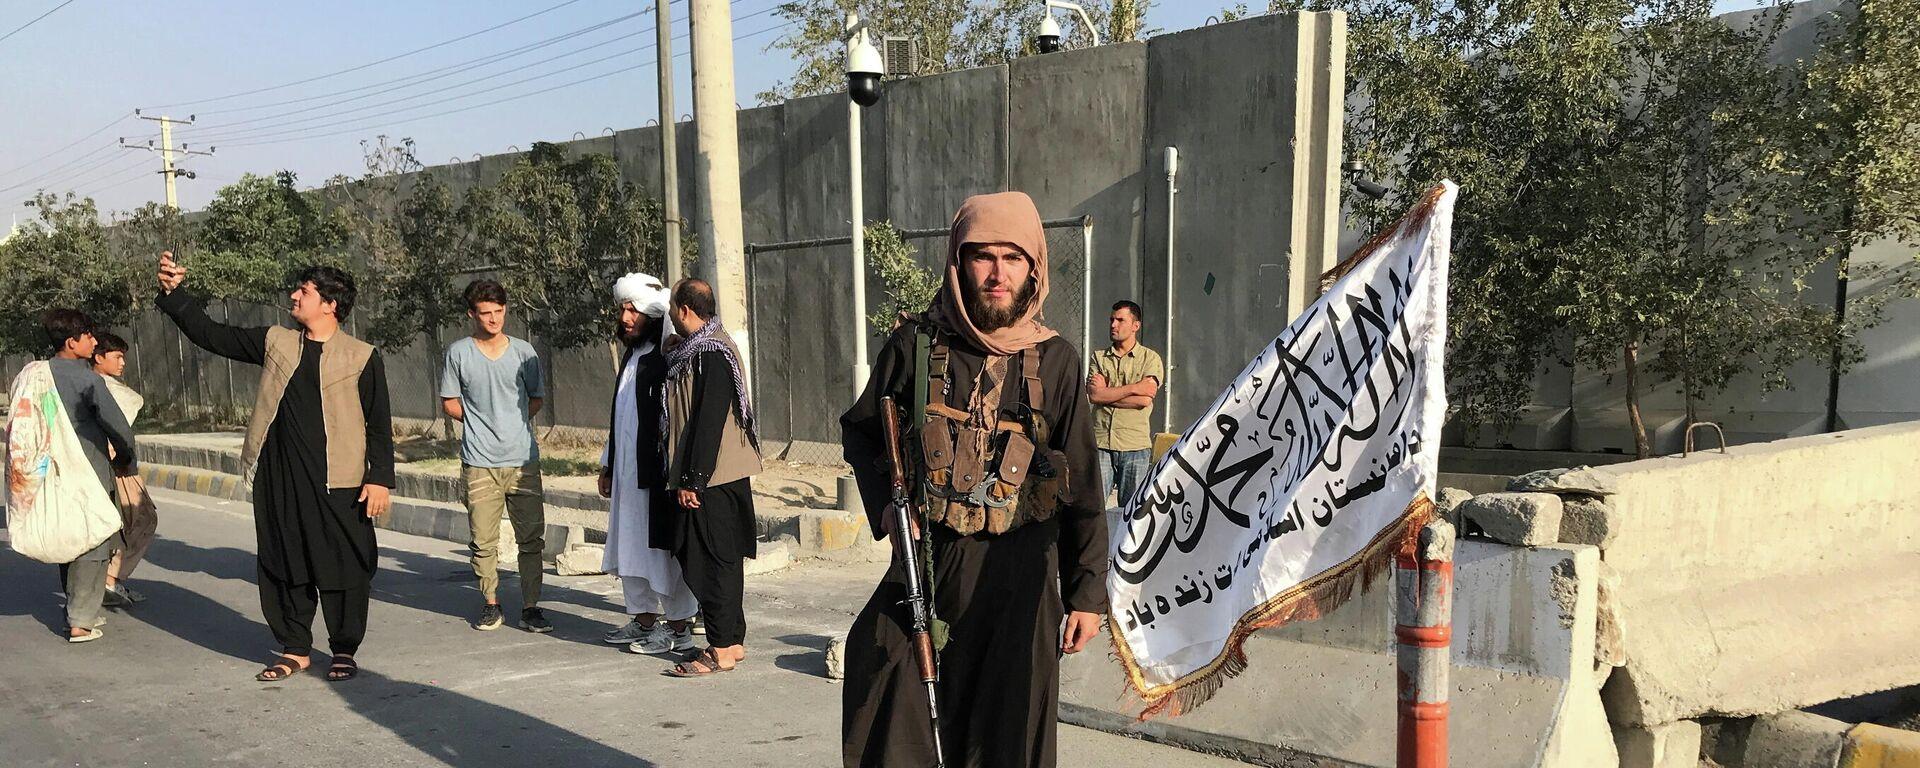 Talibanes en Kabul, Afganistán - Sputnik Mundo, 1920, 31.08.2021